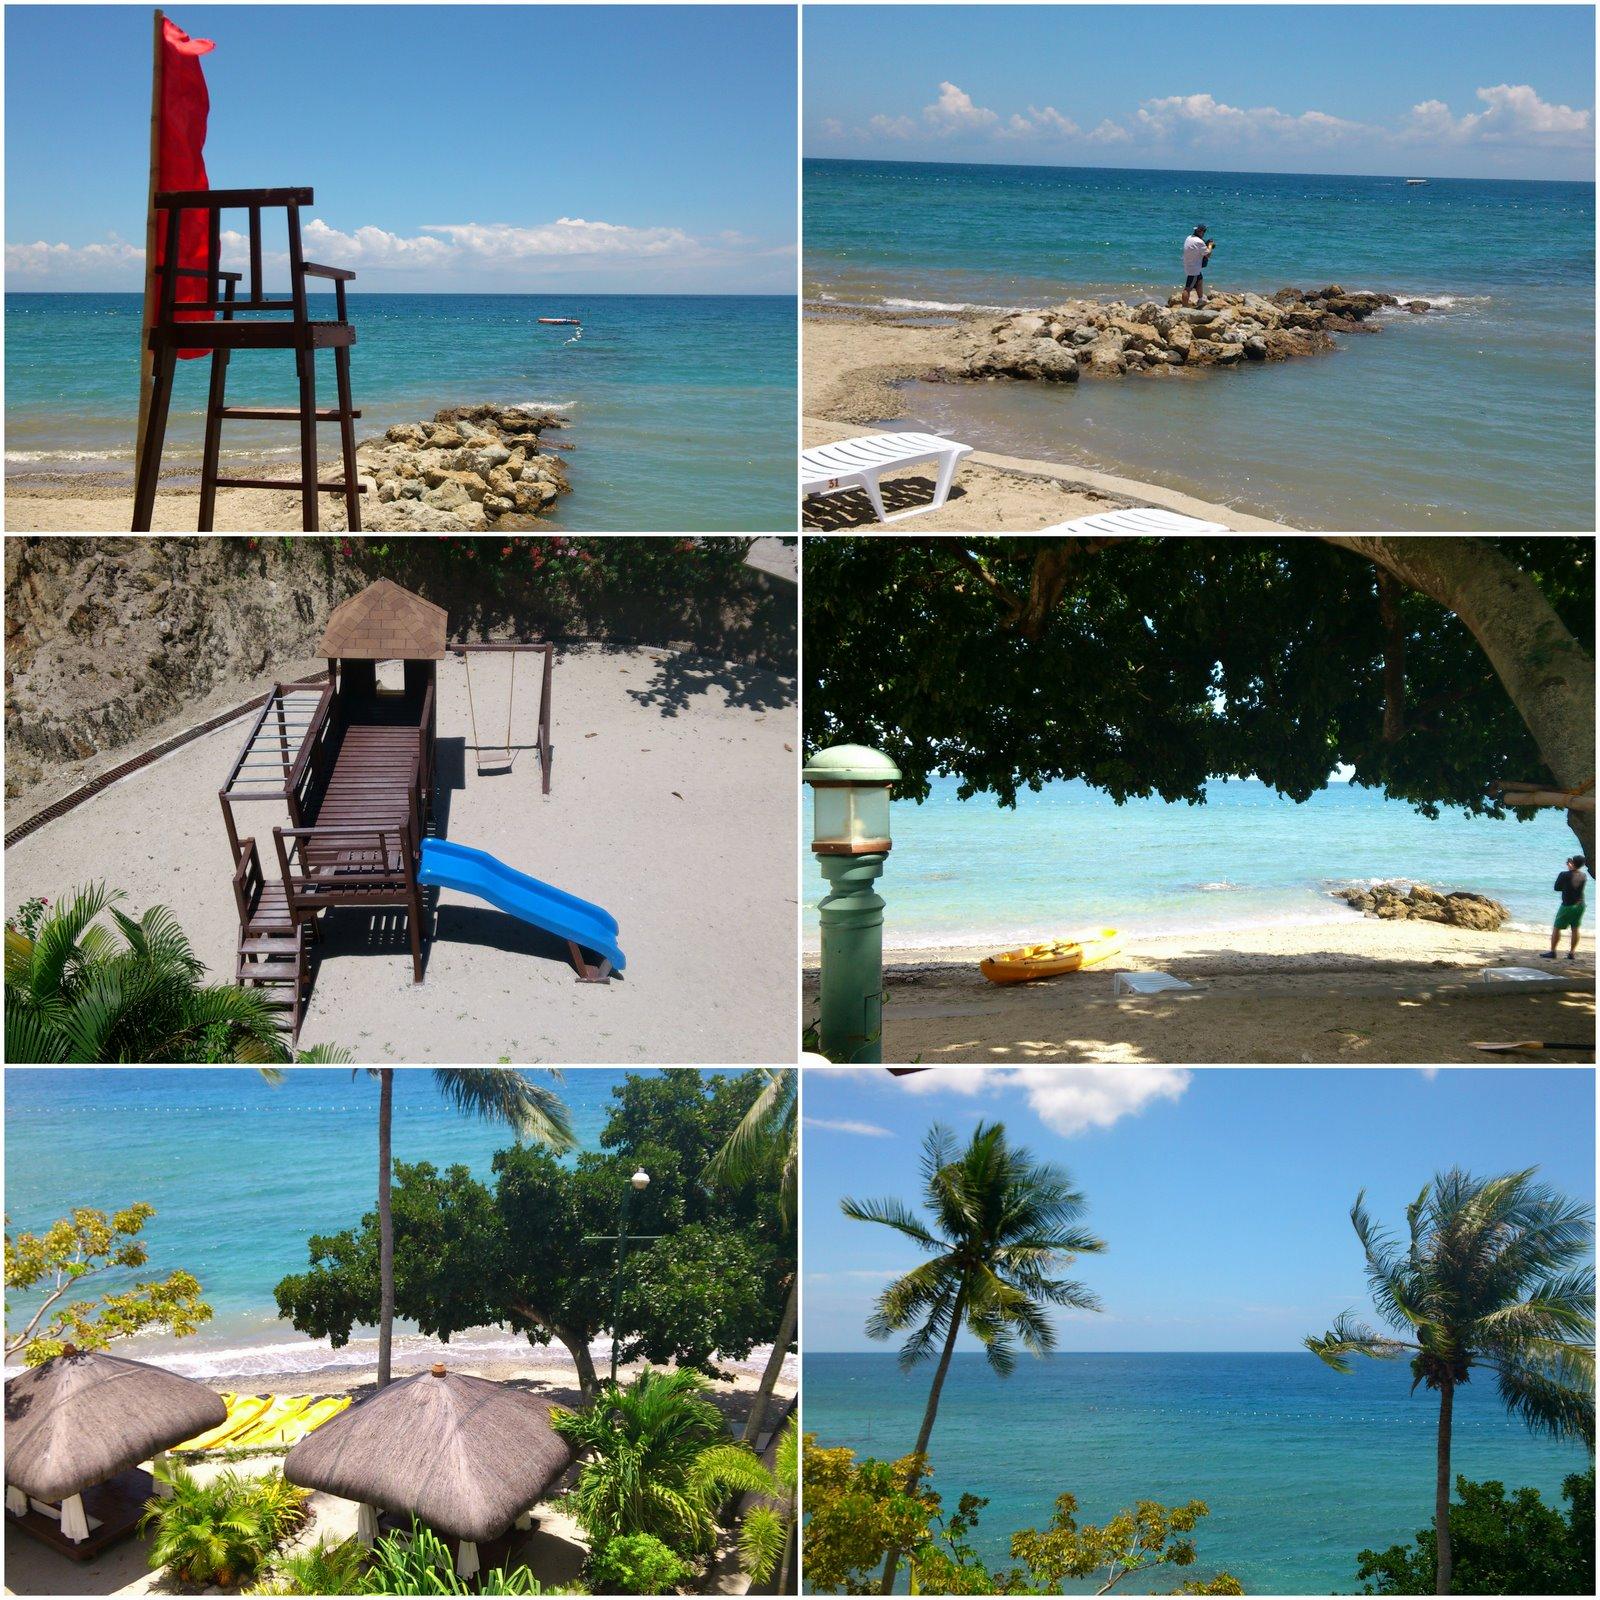 Saving Private Rian Crs Team Building 2012 Palm Beach Resort